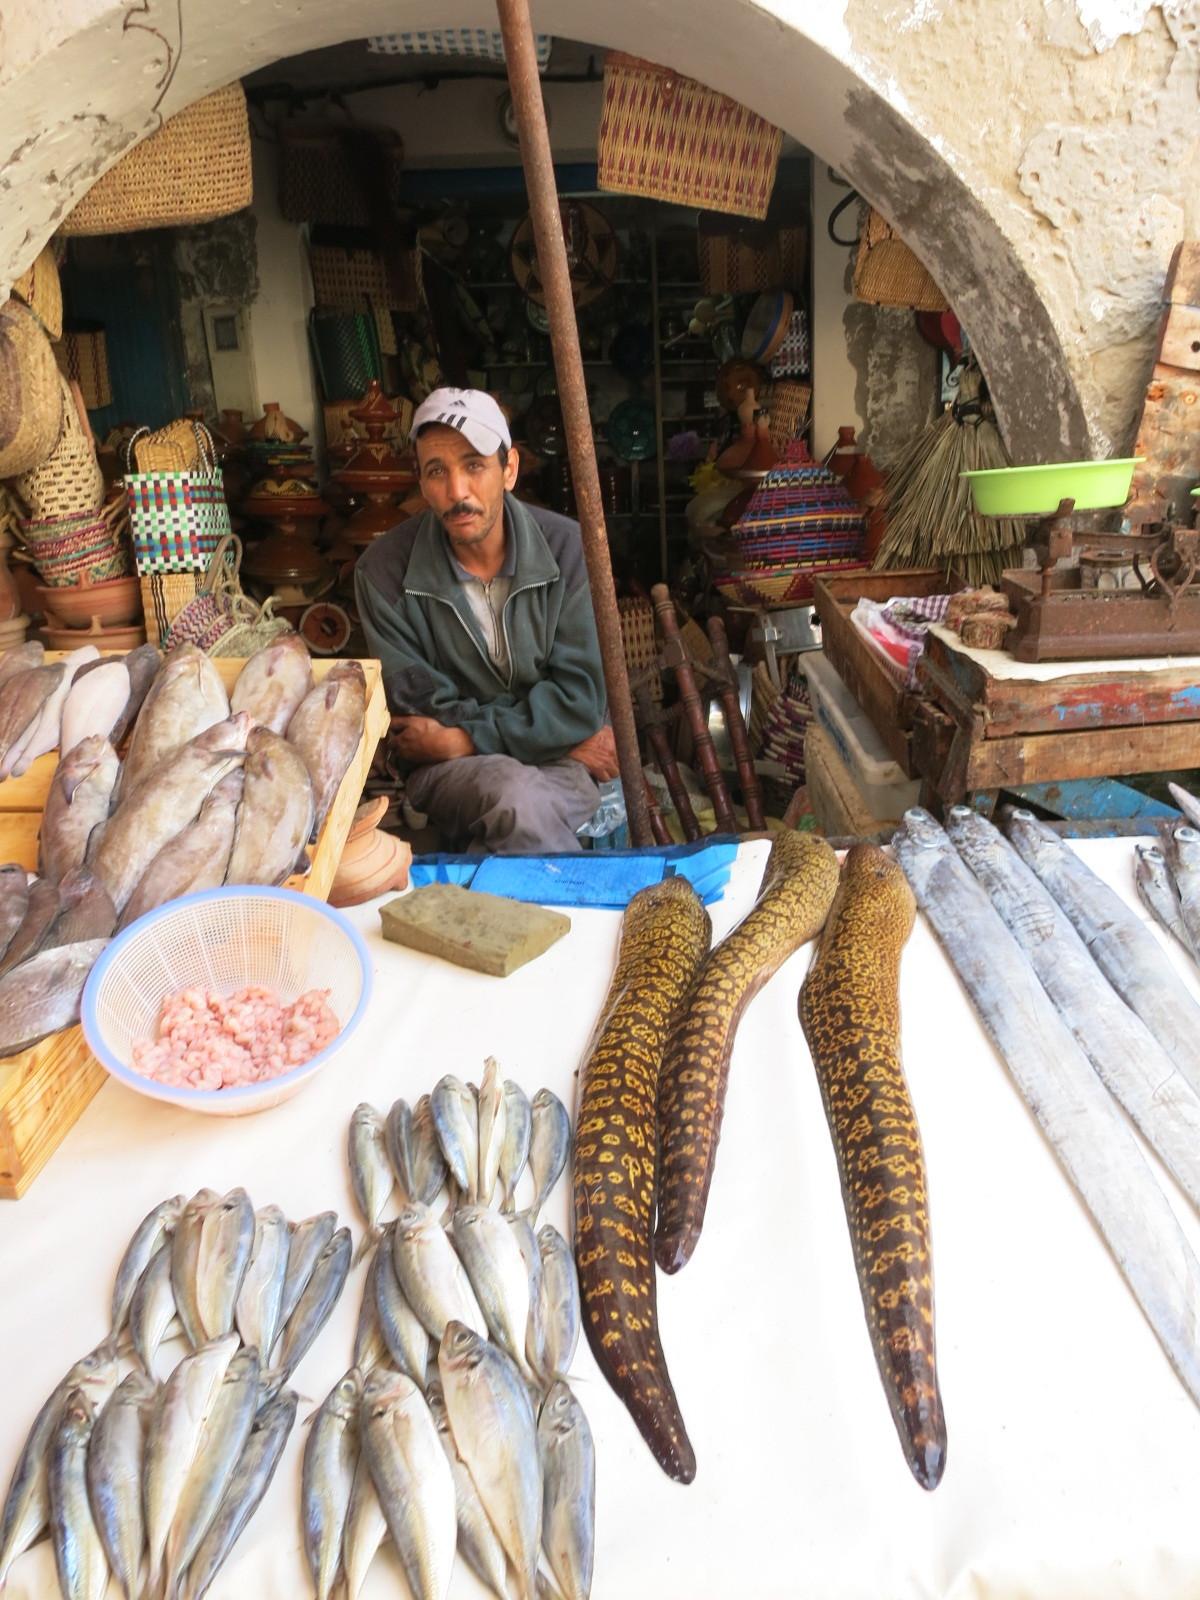 Market, Essaouira.